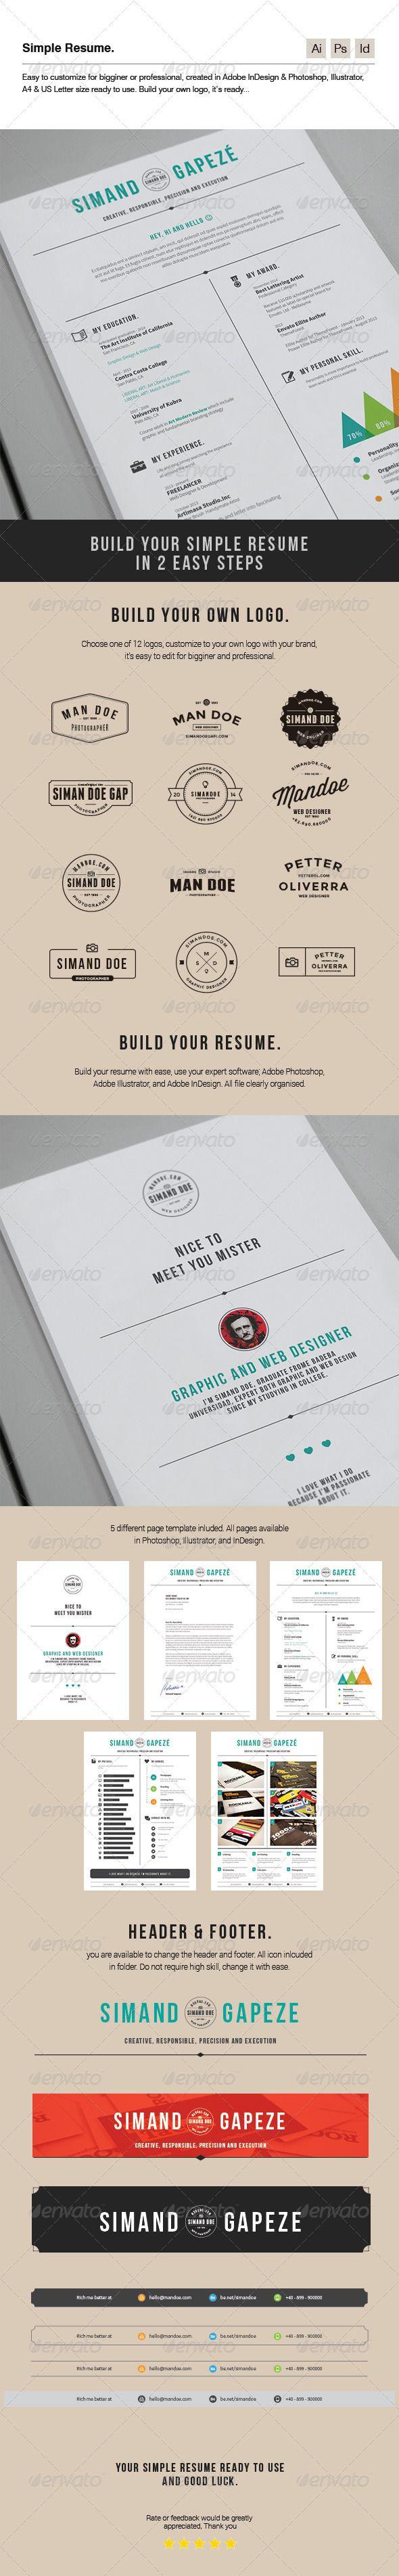 Simple Resume http://graphicriver.net/item/simple-resume/7286887?ref ...